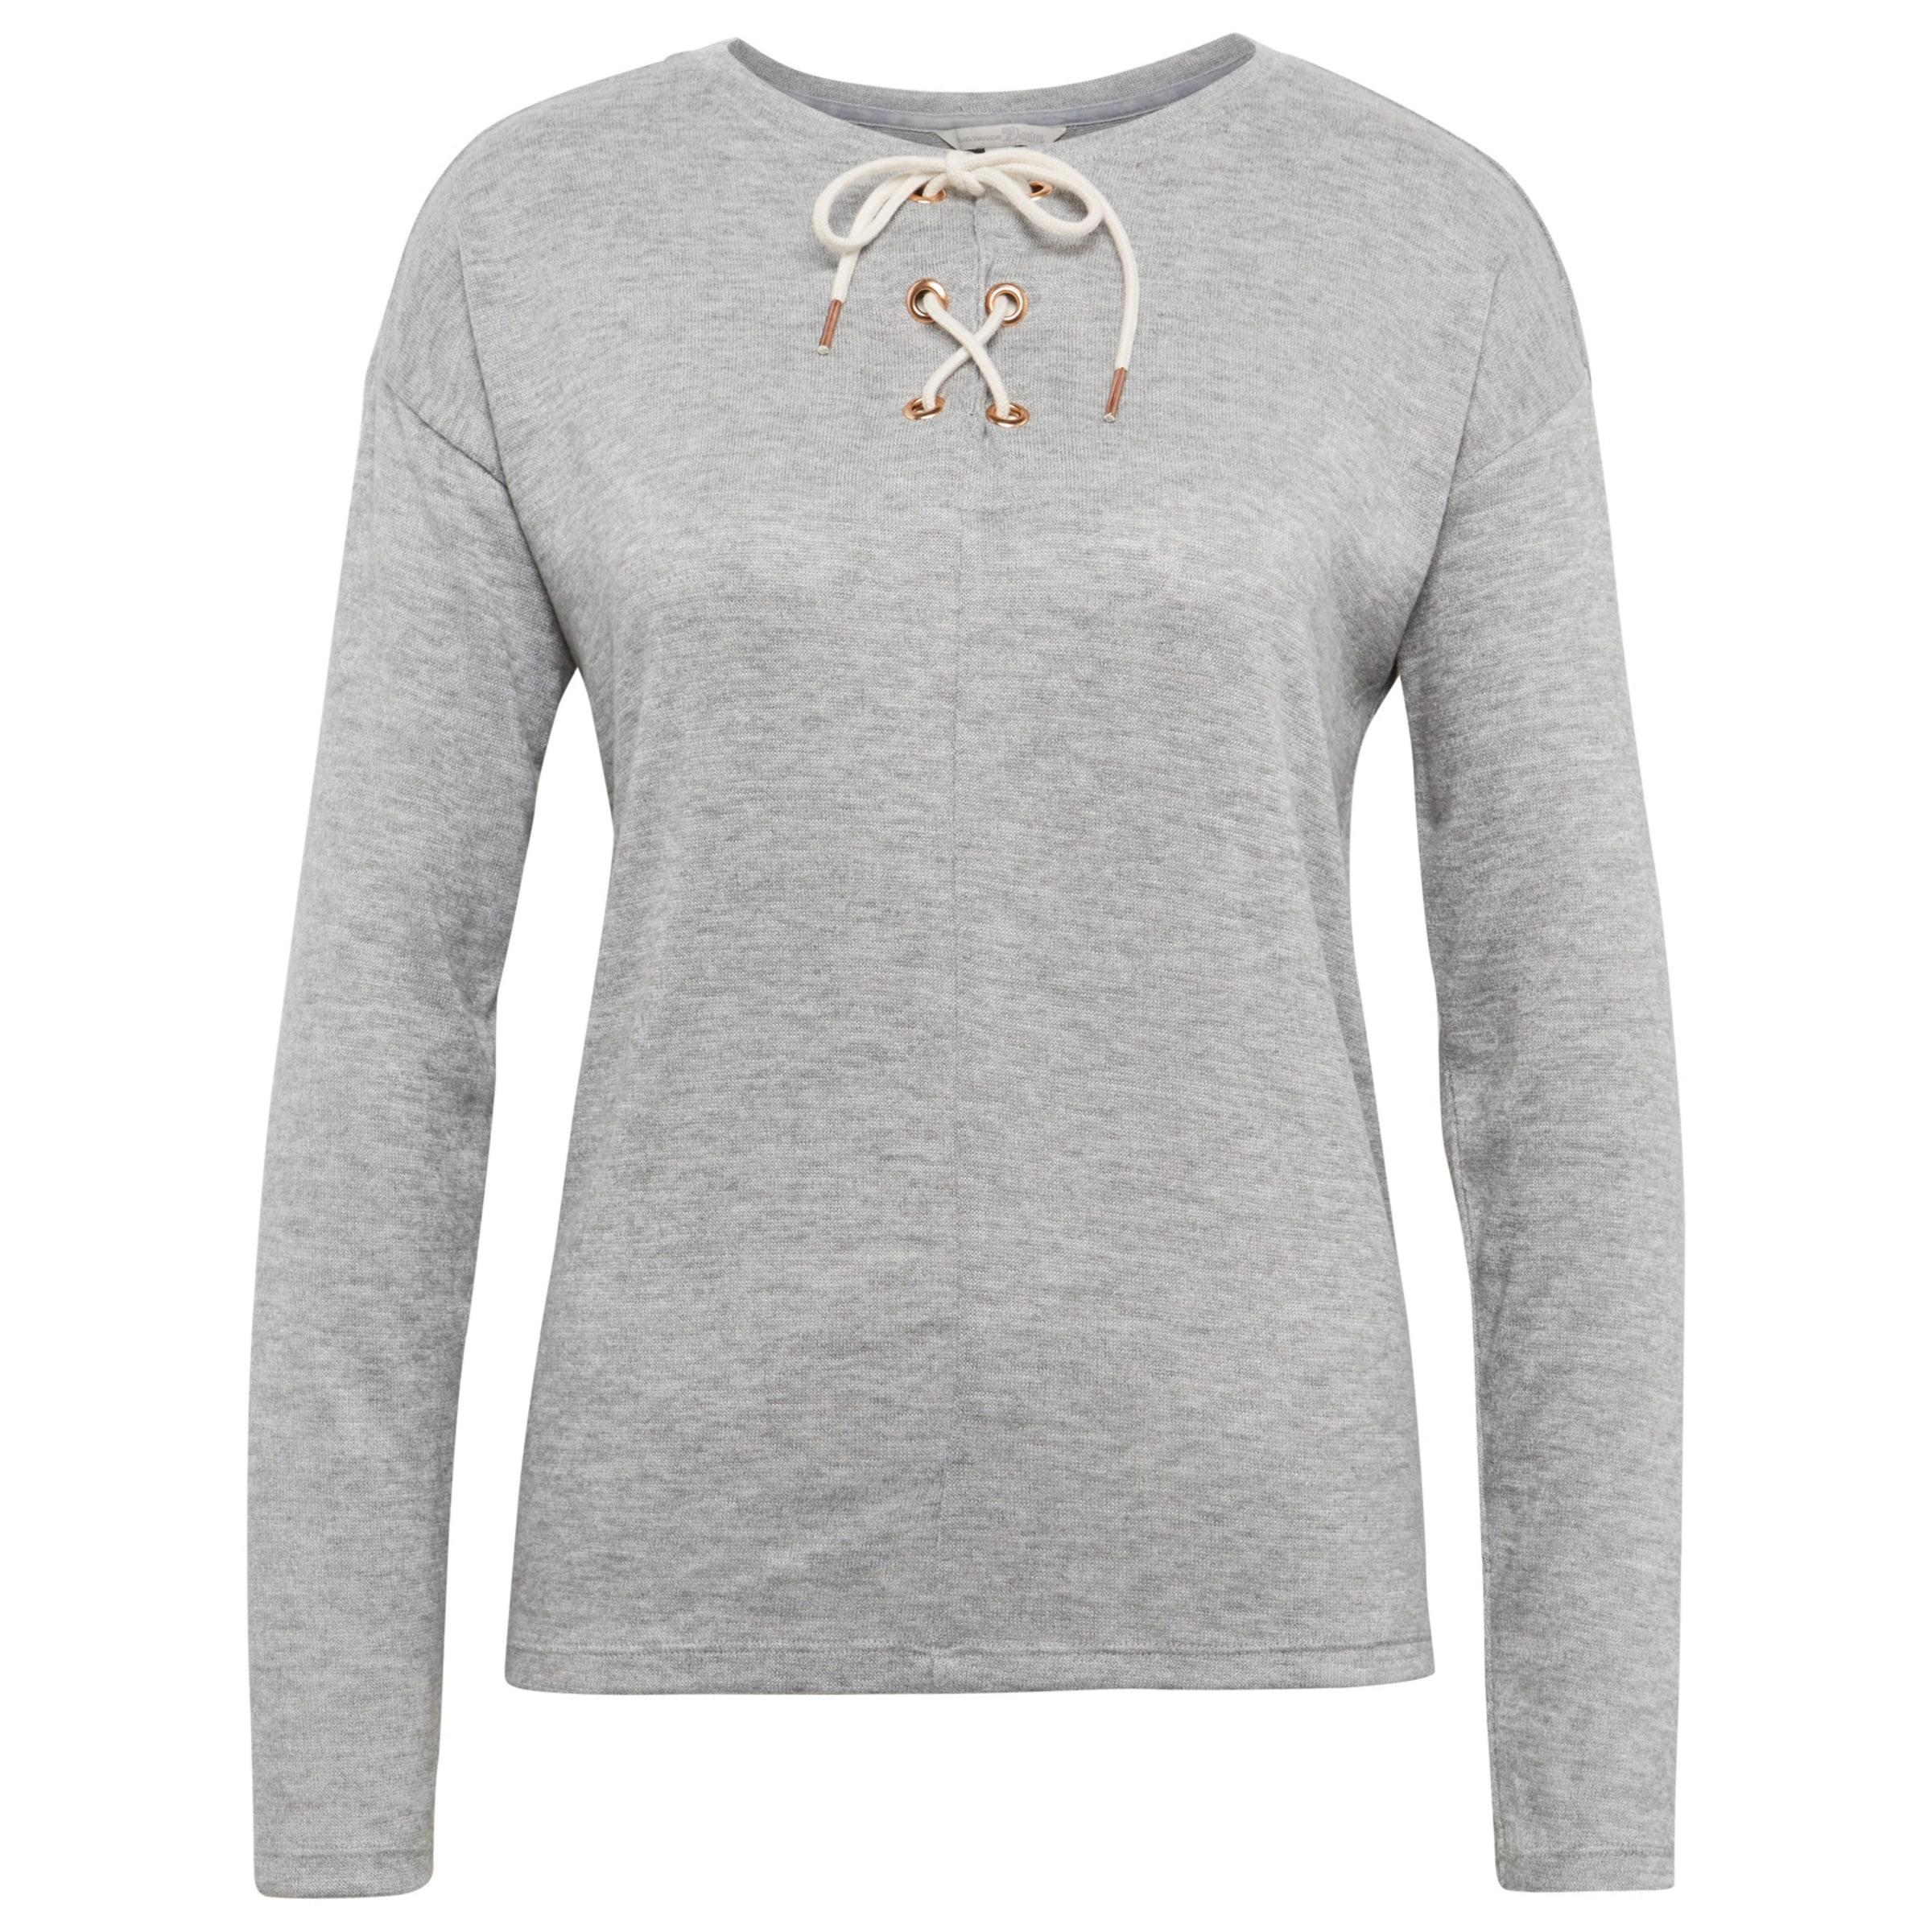 shirt Chiné Sweat Tailor Denim En Tom Gris ZikXPu